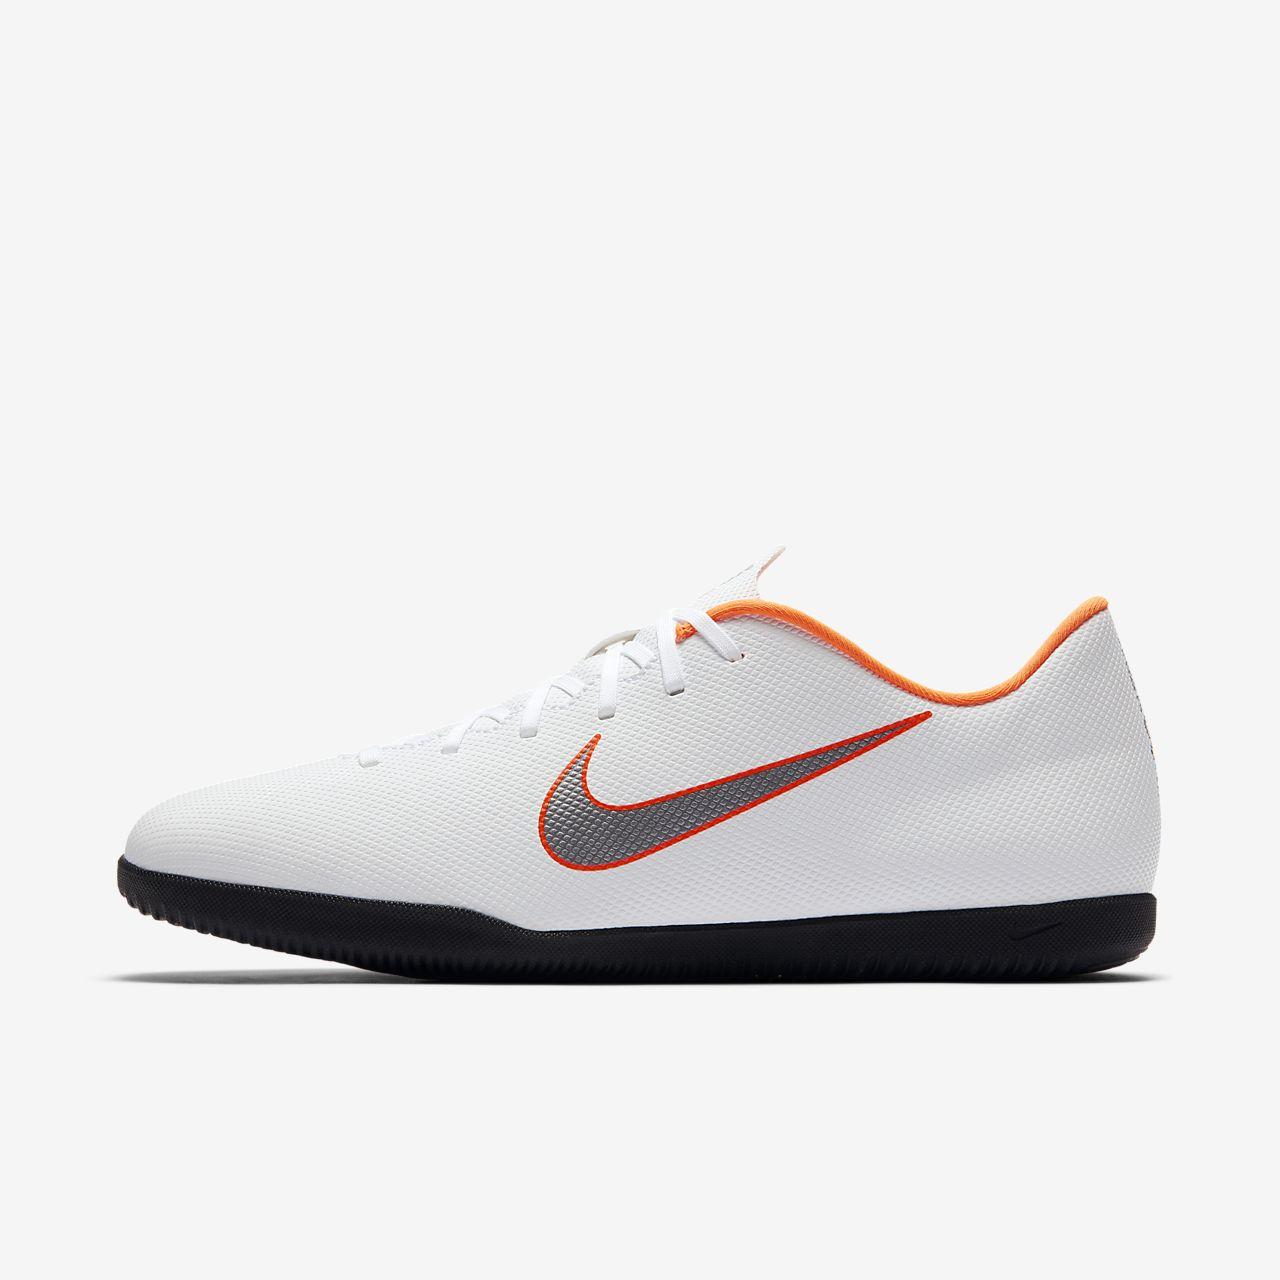 483cc861e38a ... new zealand nike mercurialx vapor xii club ic indoor court football shoe  2bc84 c9a17